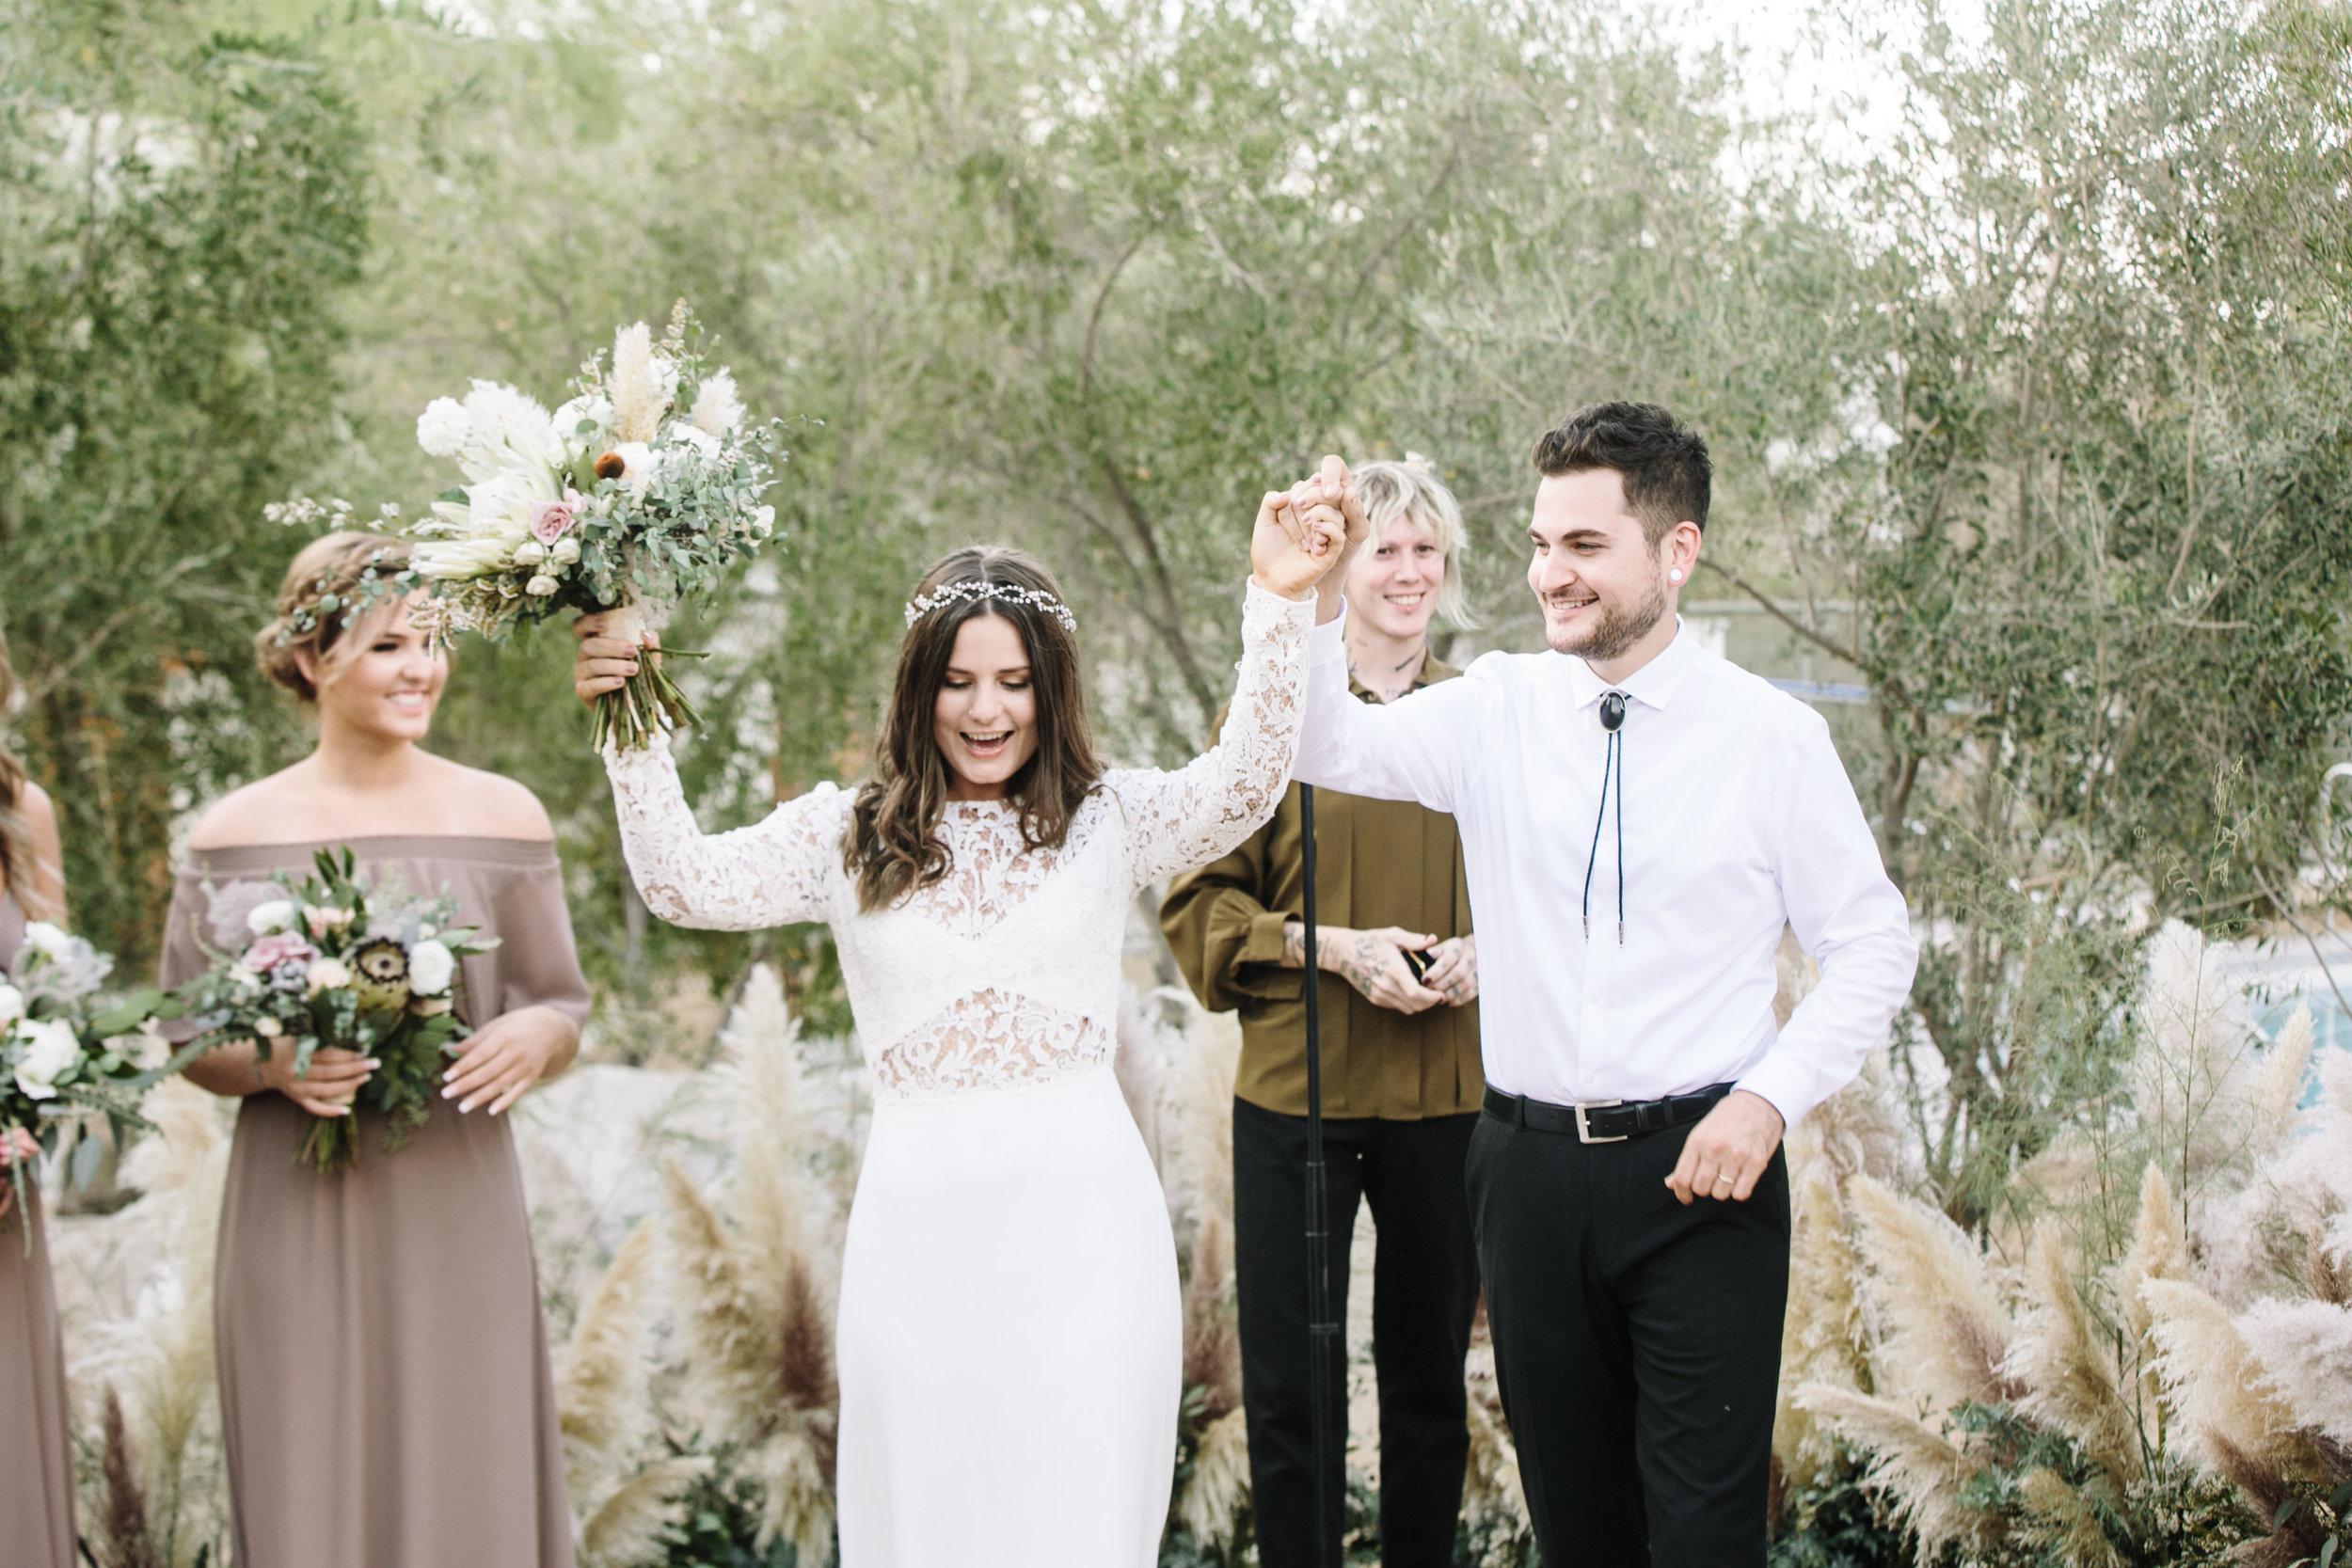 Ace Hotel Palm Springs Wedding Couple Says I DO